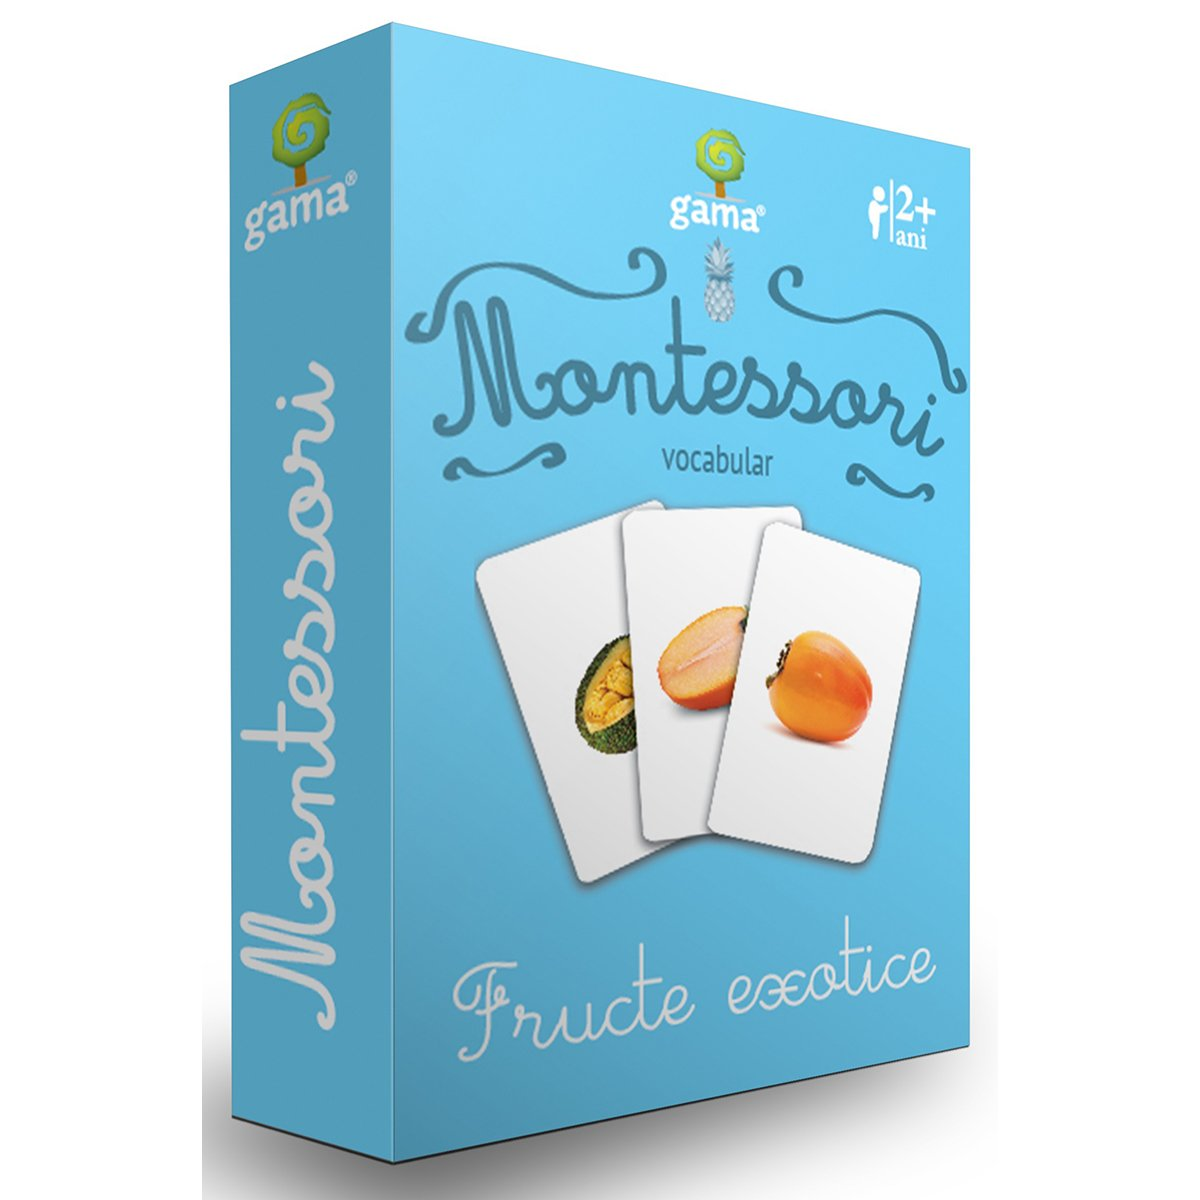 Editura Gama, Carti de joc educative Montessori Seria 2, Vocabular, Fructe exotice